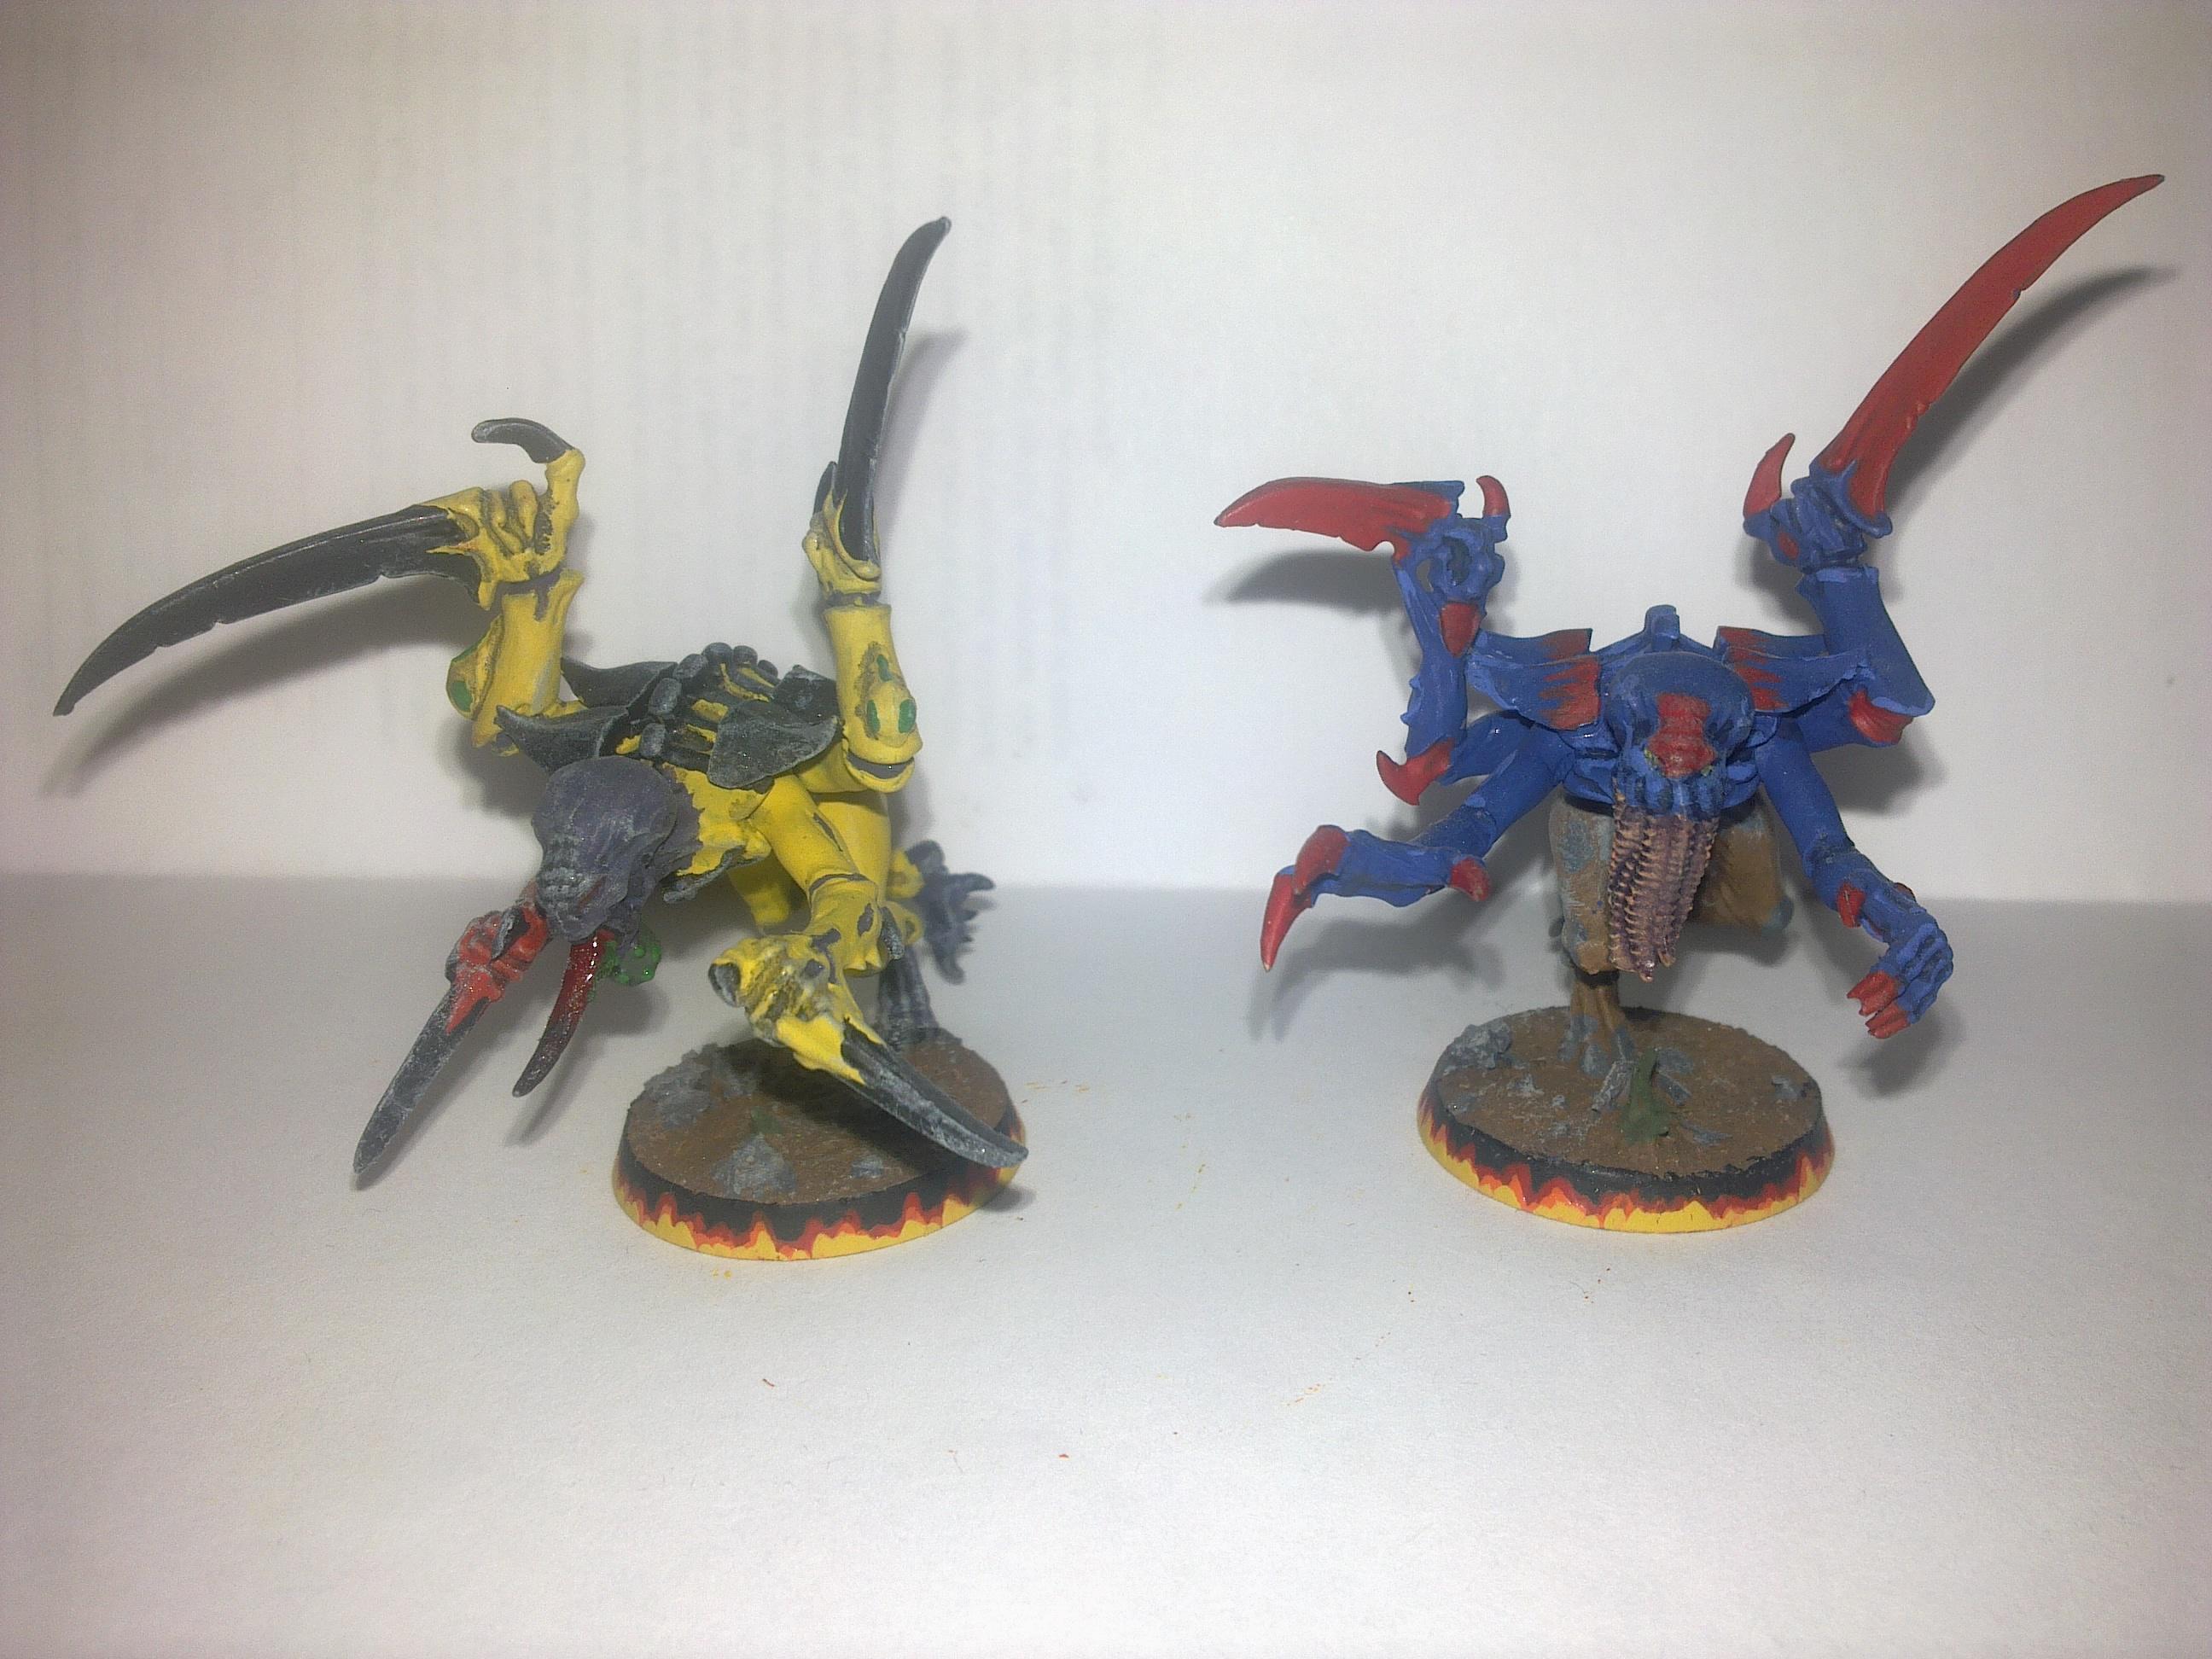 Genestealer, Tyranids, Warhammer 40,000, Ymgarl Genestealers